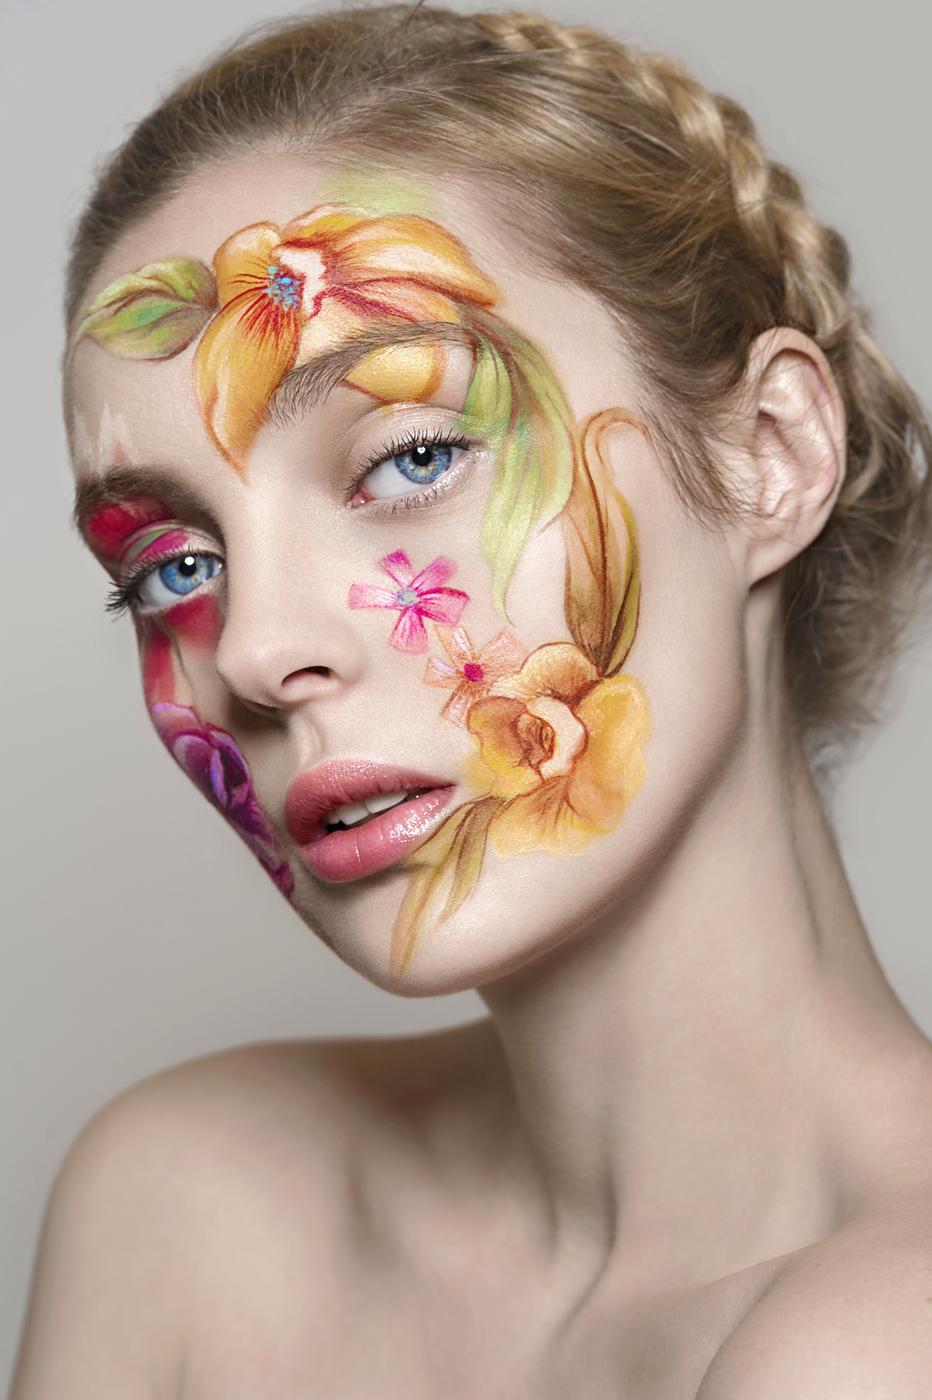 Damien Mohn Flowers Retouch by AMarfoog by damdam78